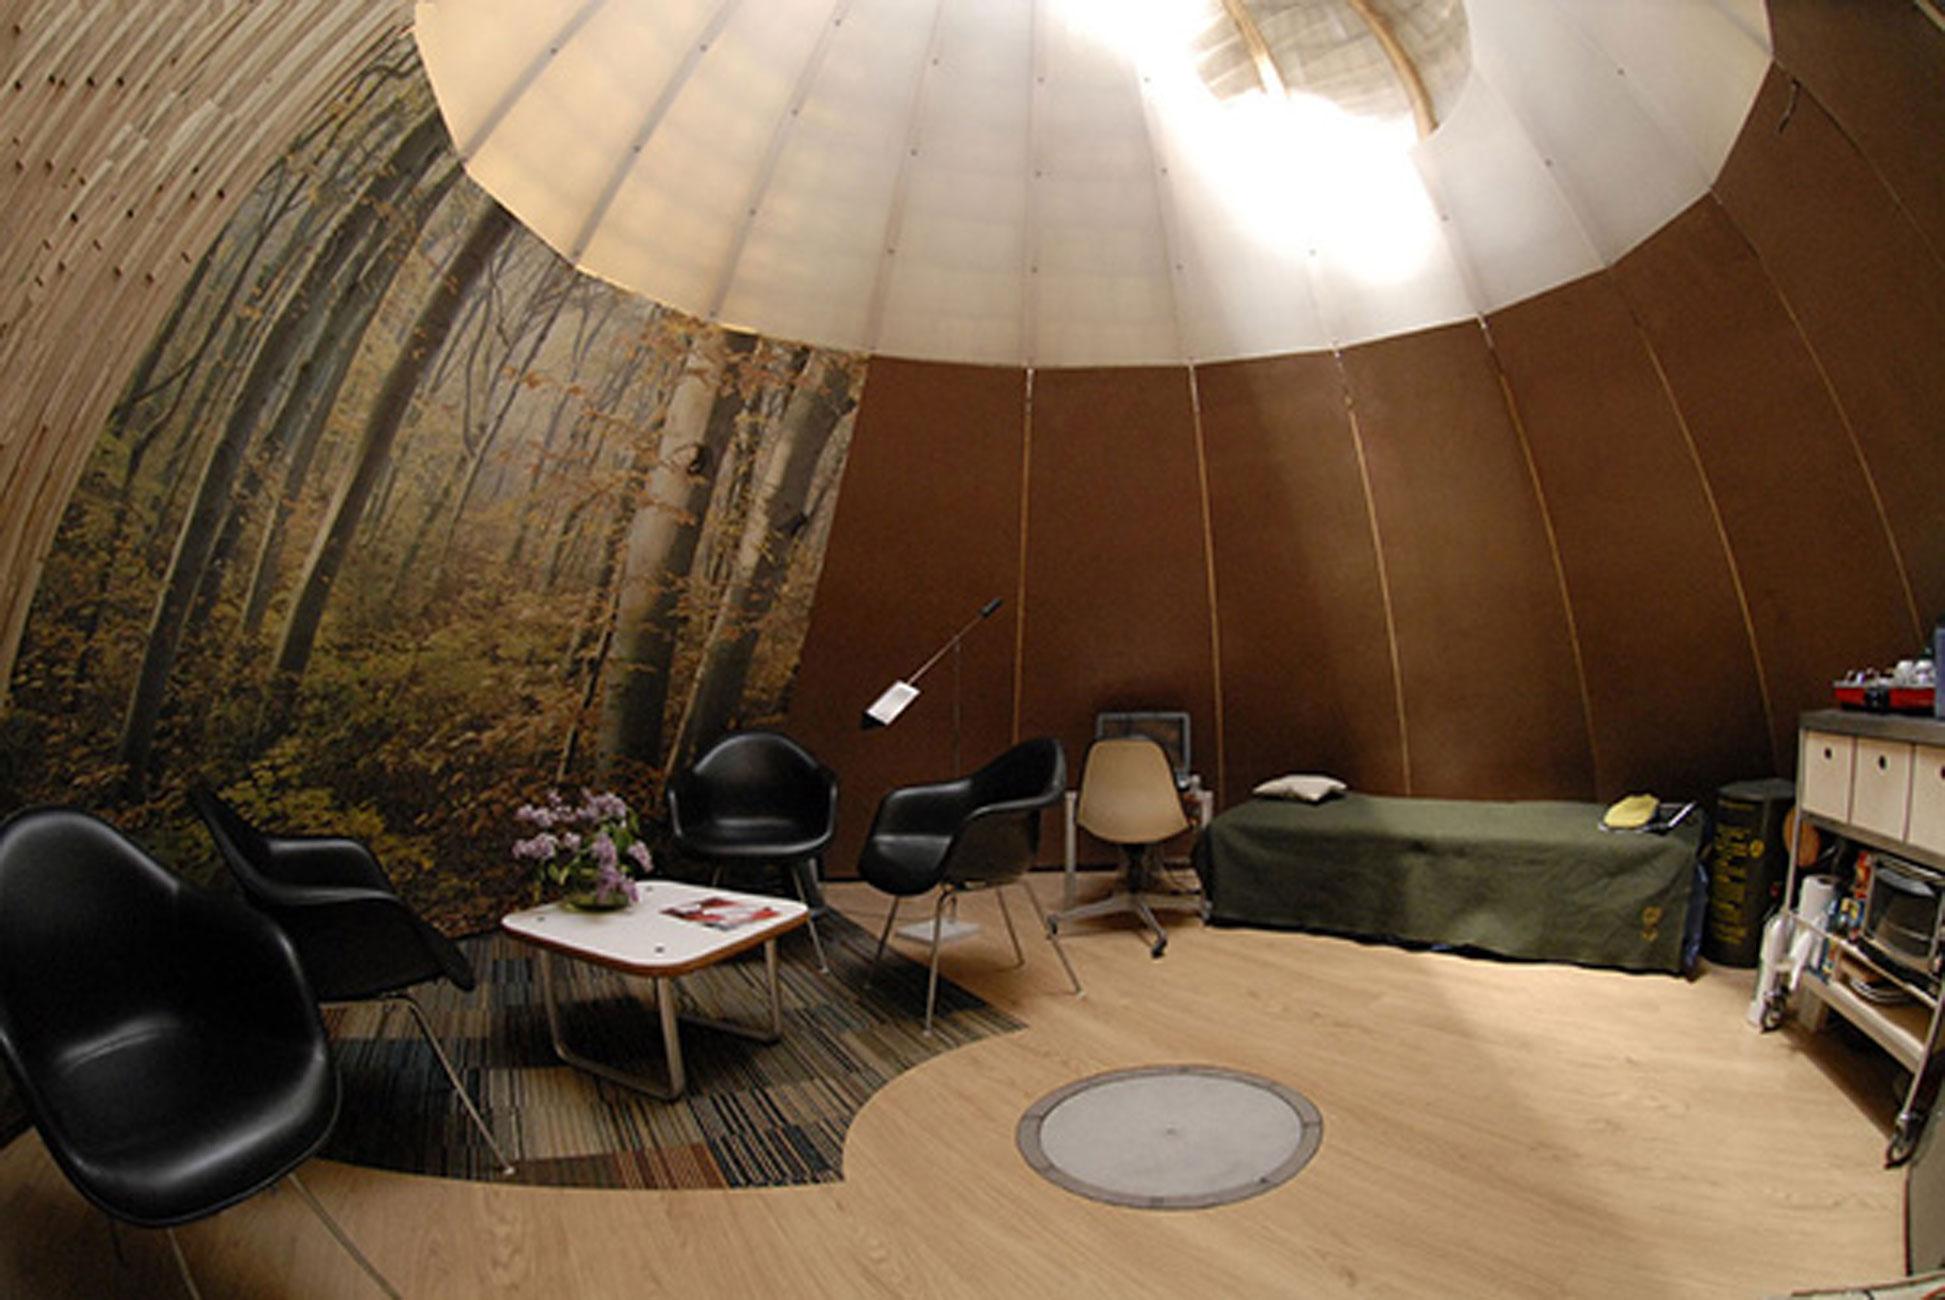 Merveilleux Native American Tent Architecture, Futuristic Tipi Design U2013 Interior